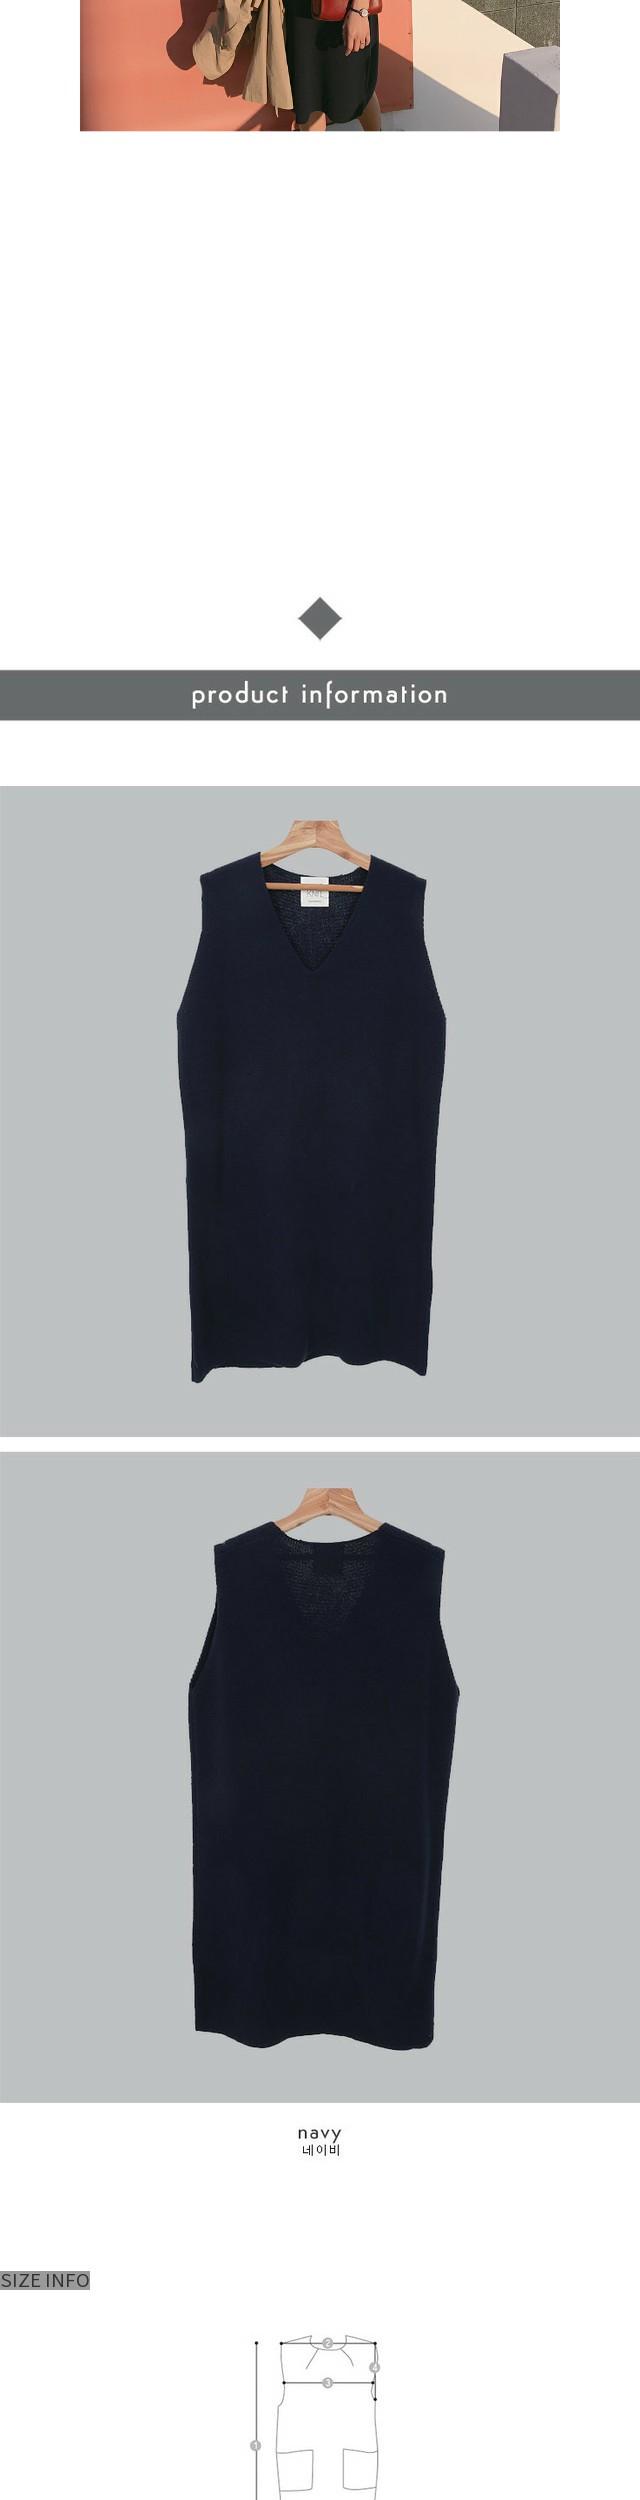 College-knit dress